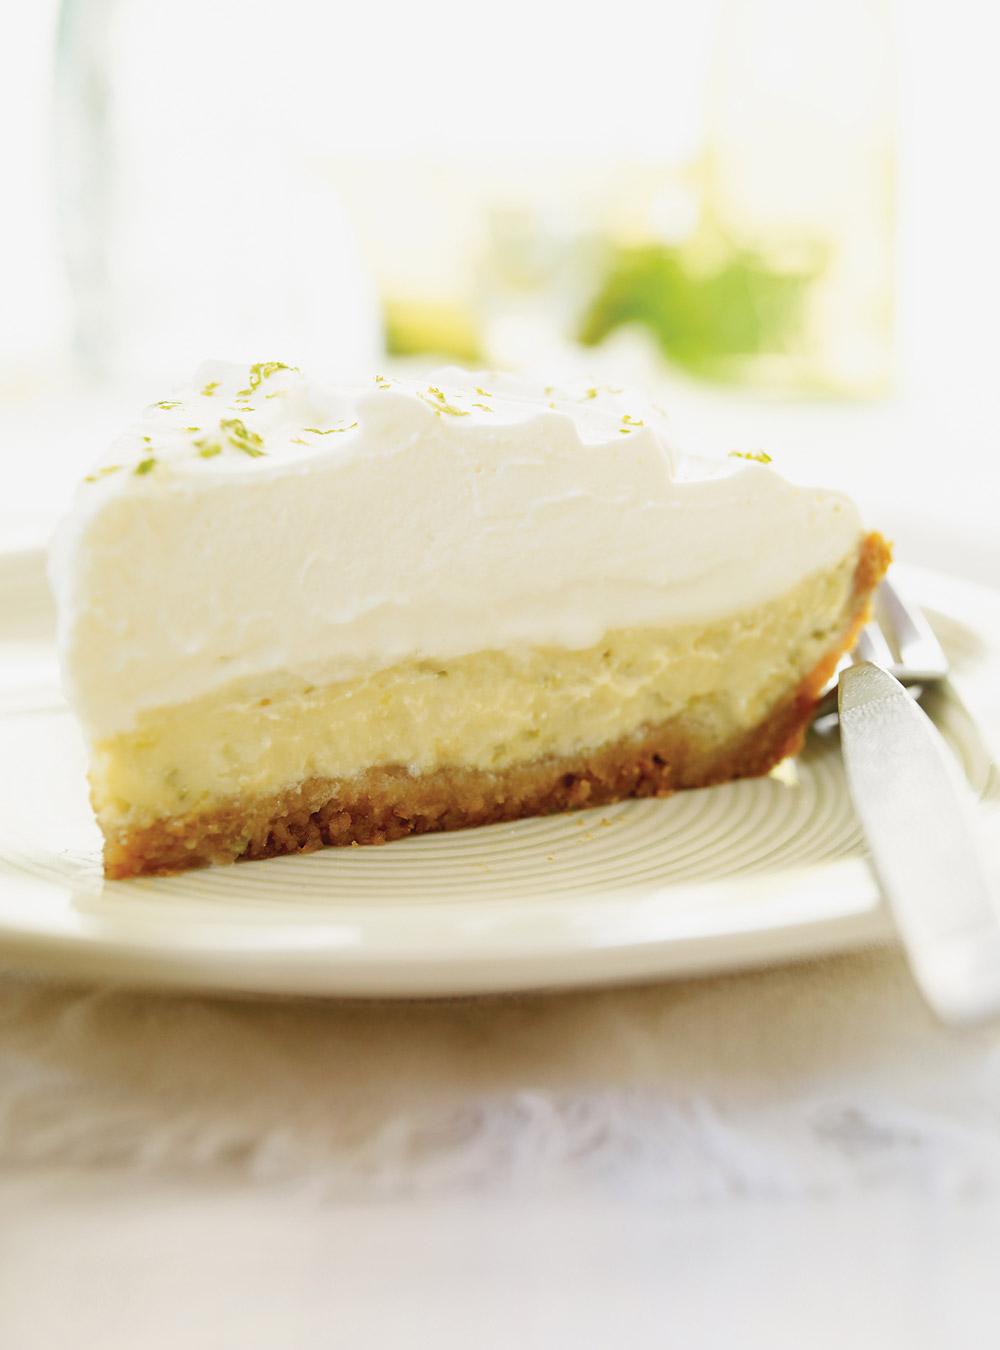 Tarte à la lime (key lime pie) | ricardo